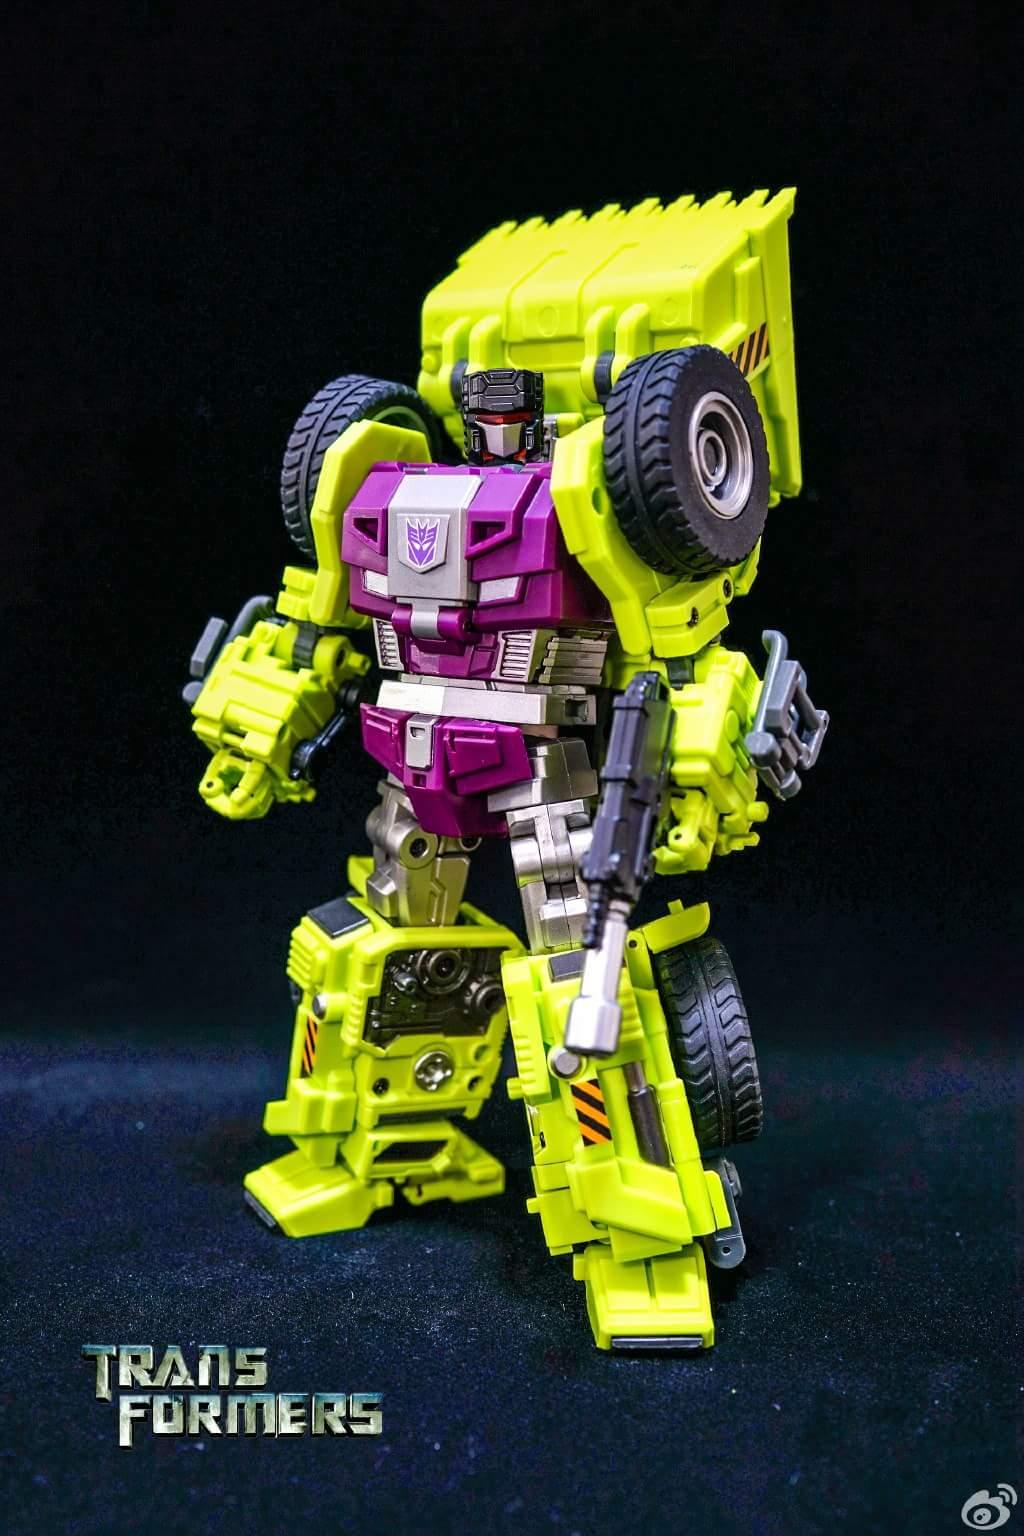 [Generation Toy] Produit Tiers - Jouet GT-01 Gravity Builder - aka Devastator/Dévastateur - Page 4 A0zaqo6d